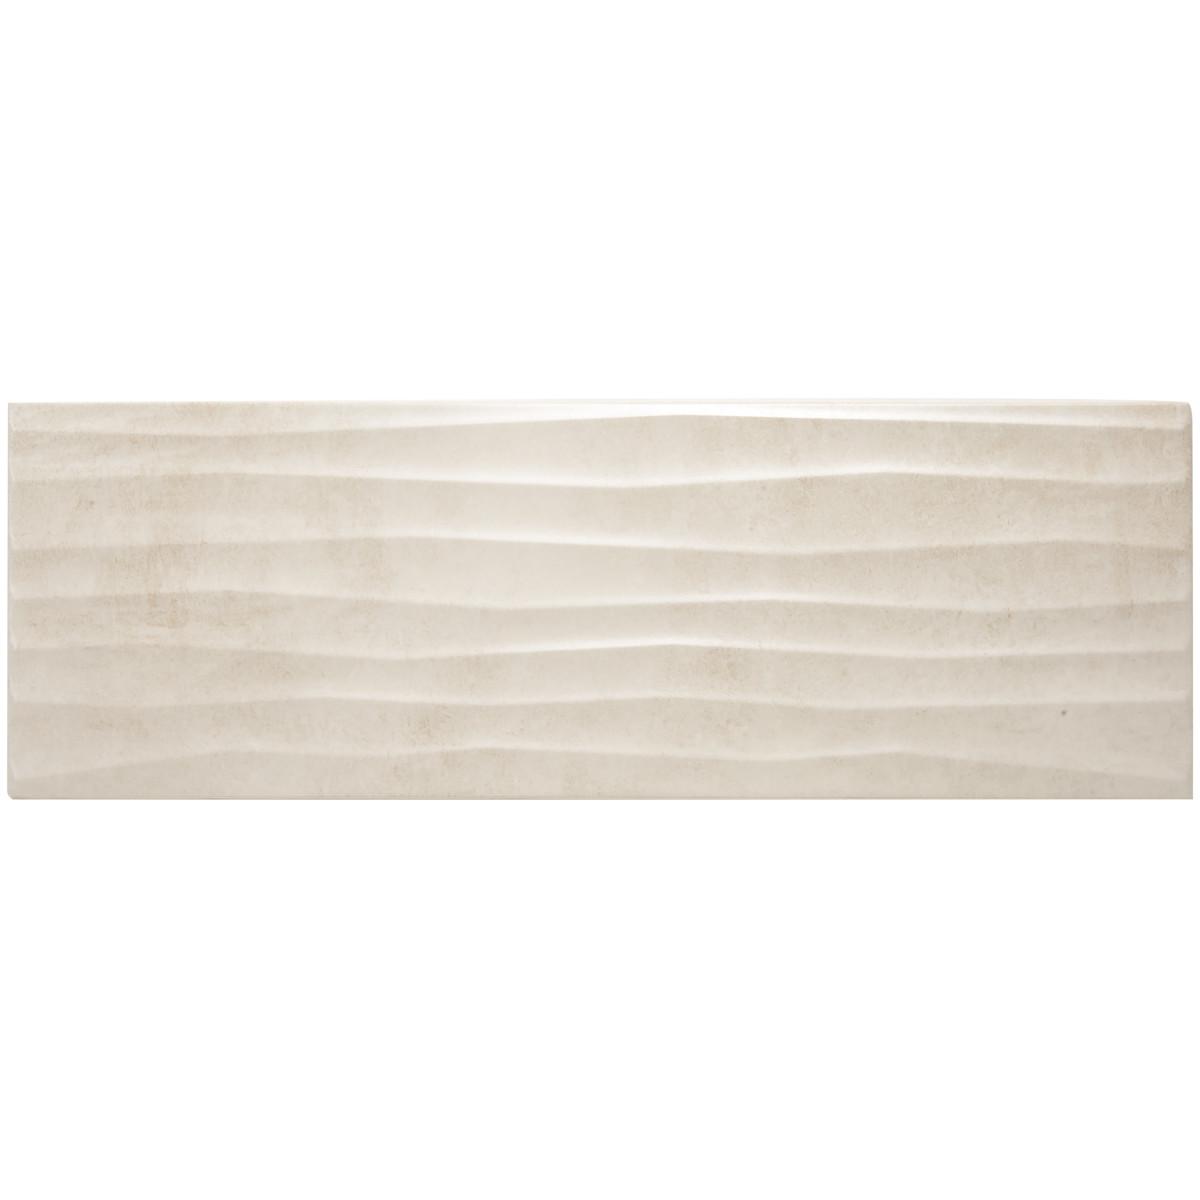 Плитка настенная Spanish Maiolica 20х60 см 0.84 м2 цвет бежевый